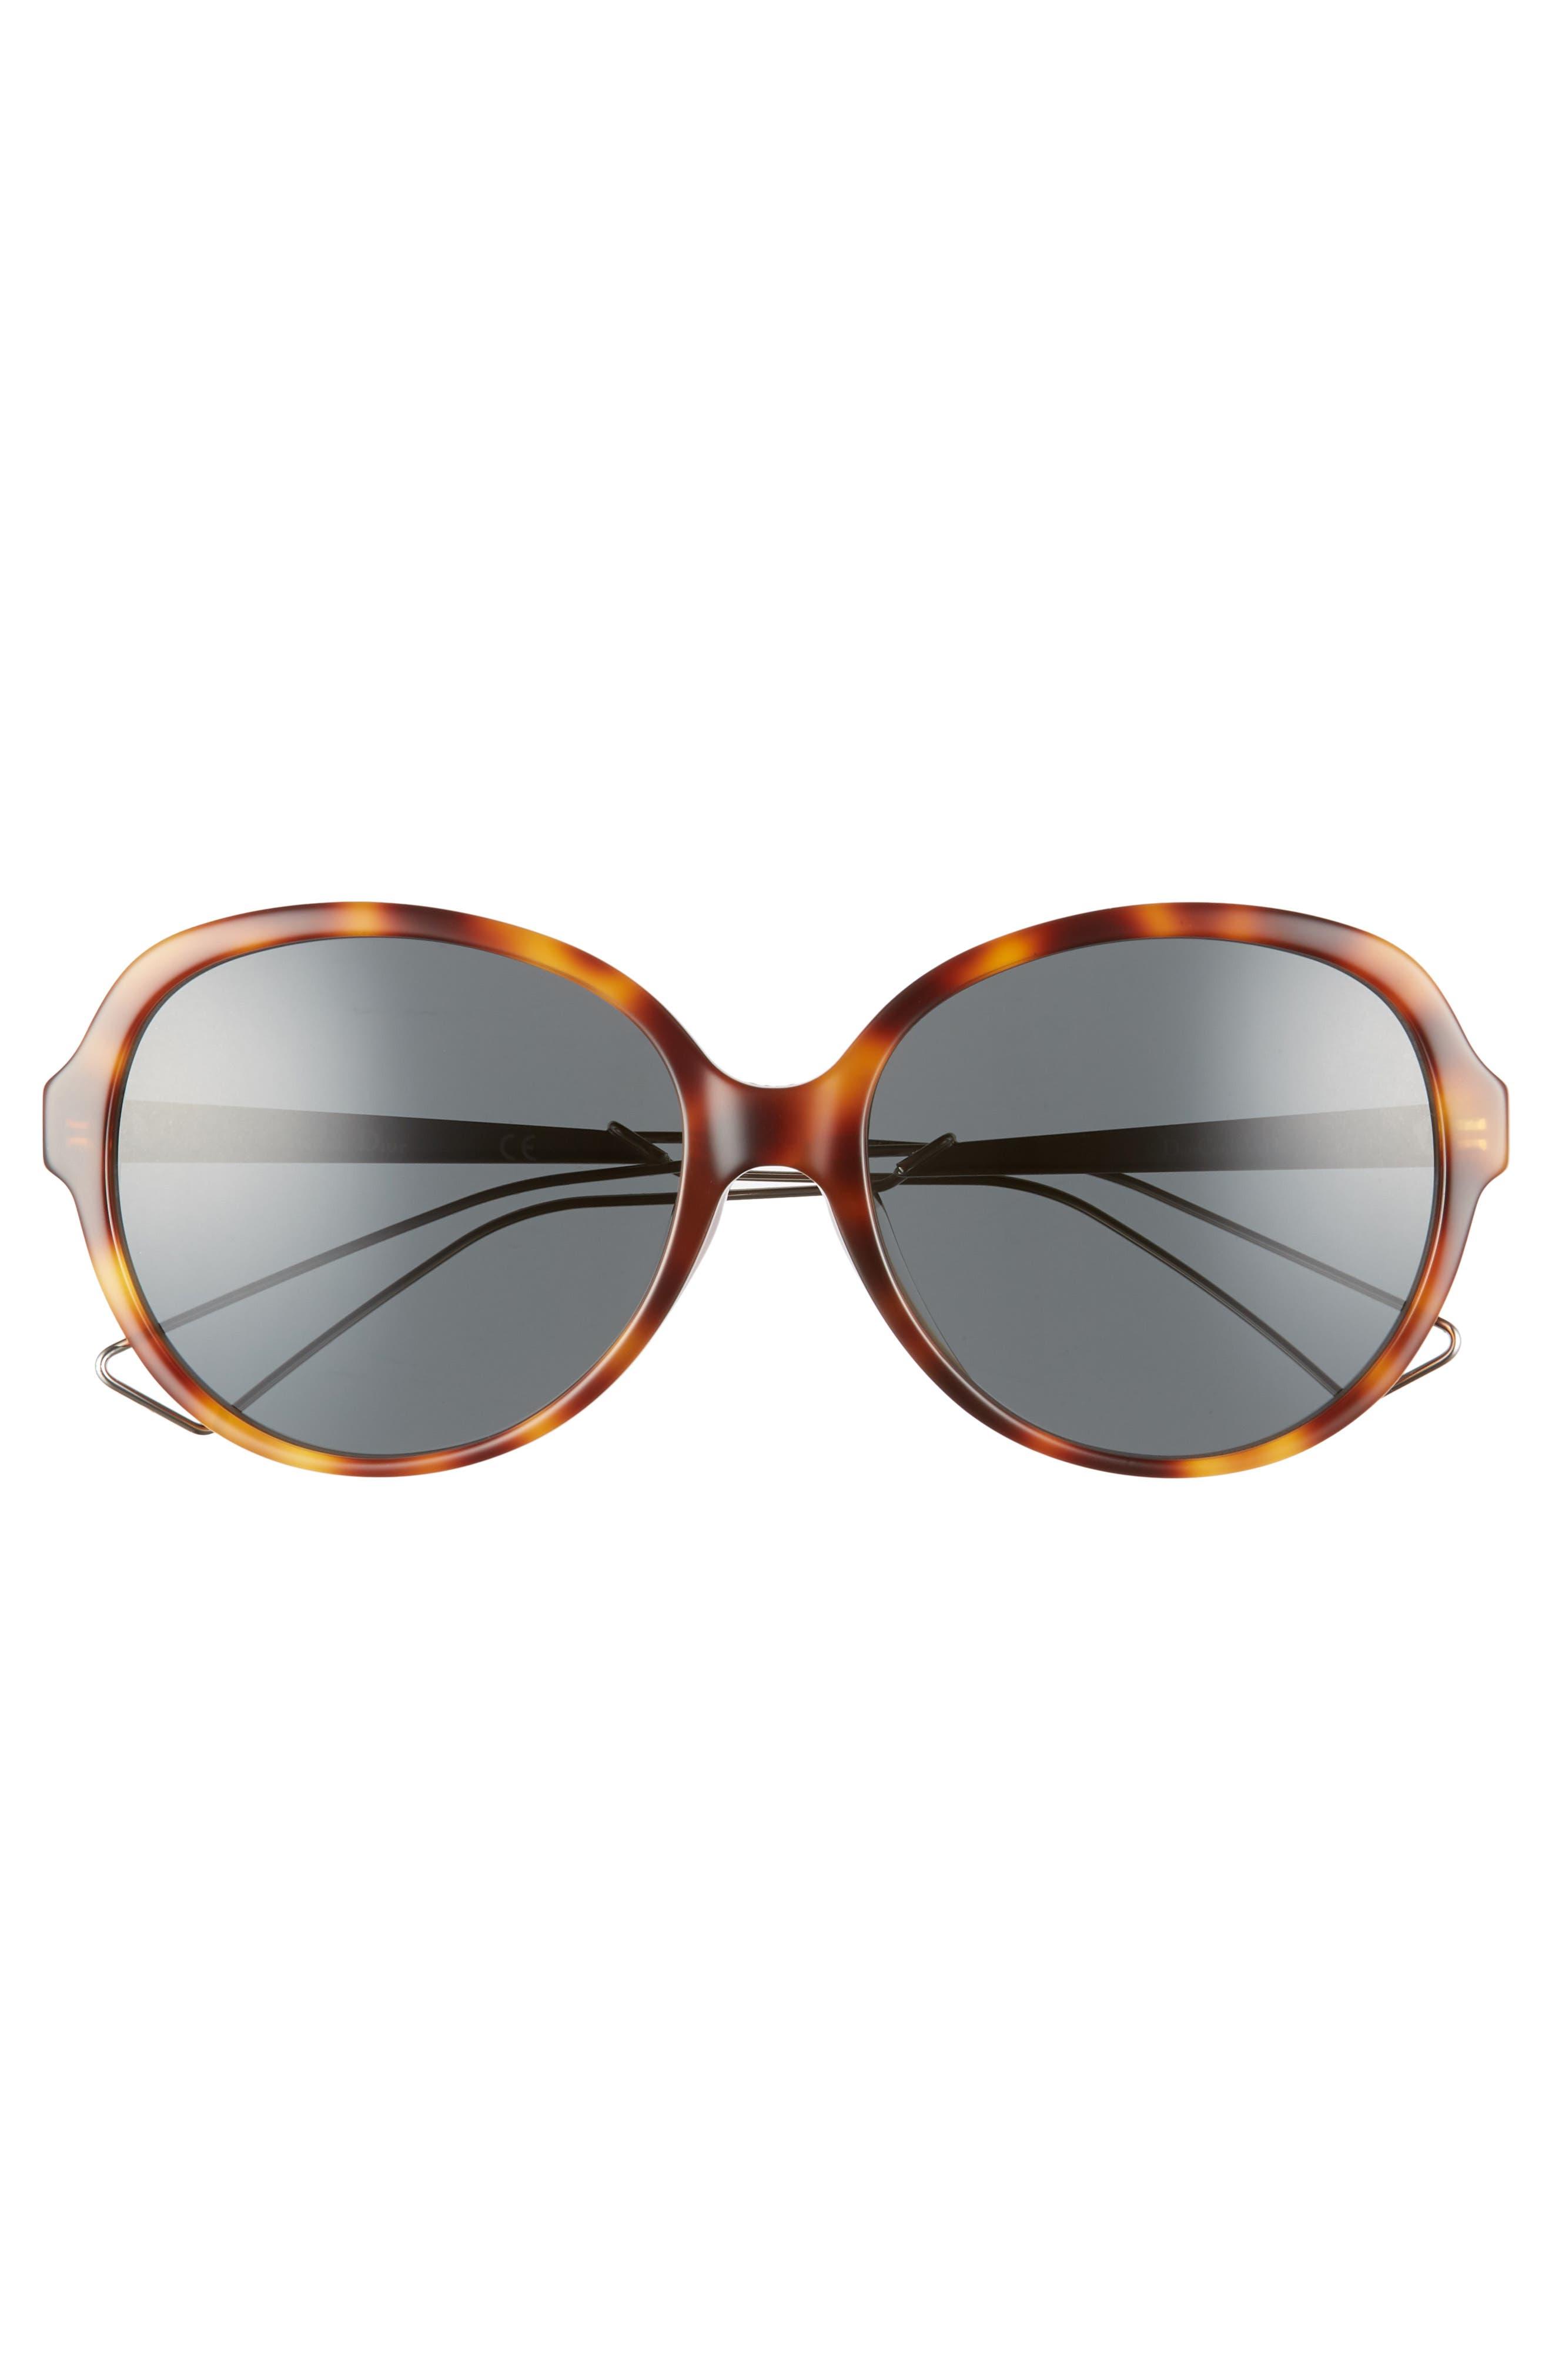 Confident 58mm Round Sunglasses,                             Alternate thumbnail 3, color,                             HAVANA/ PALLADIUM